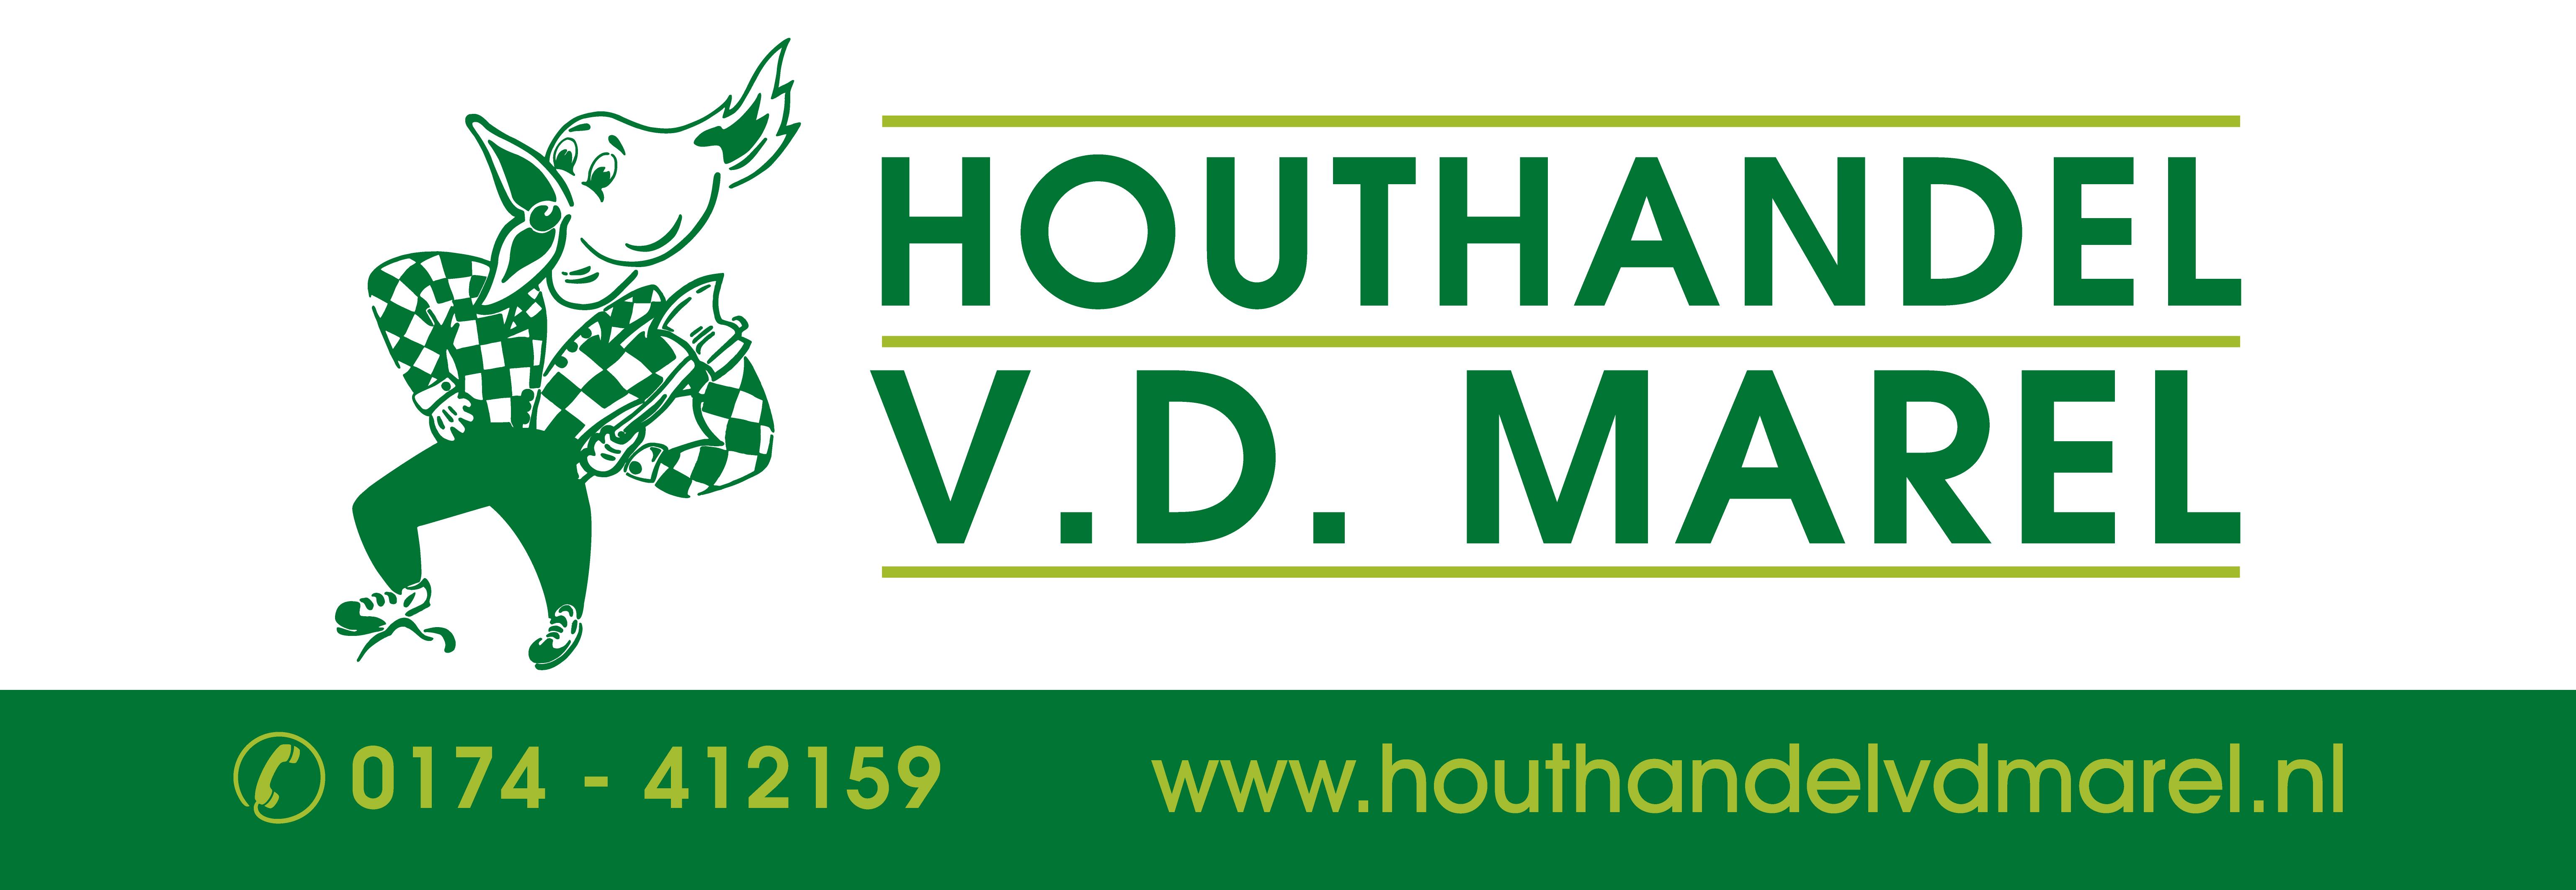 Logo Houthandel van der Marel